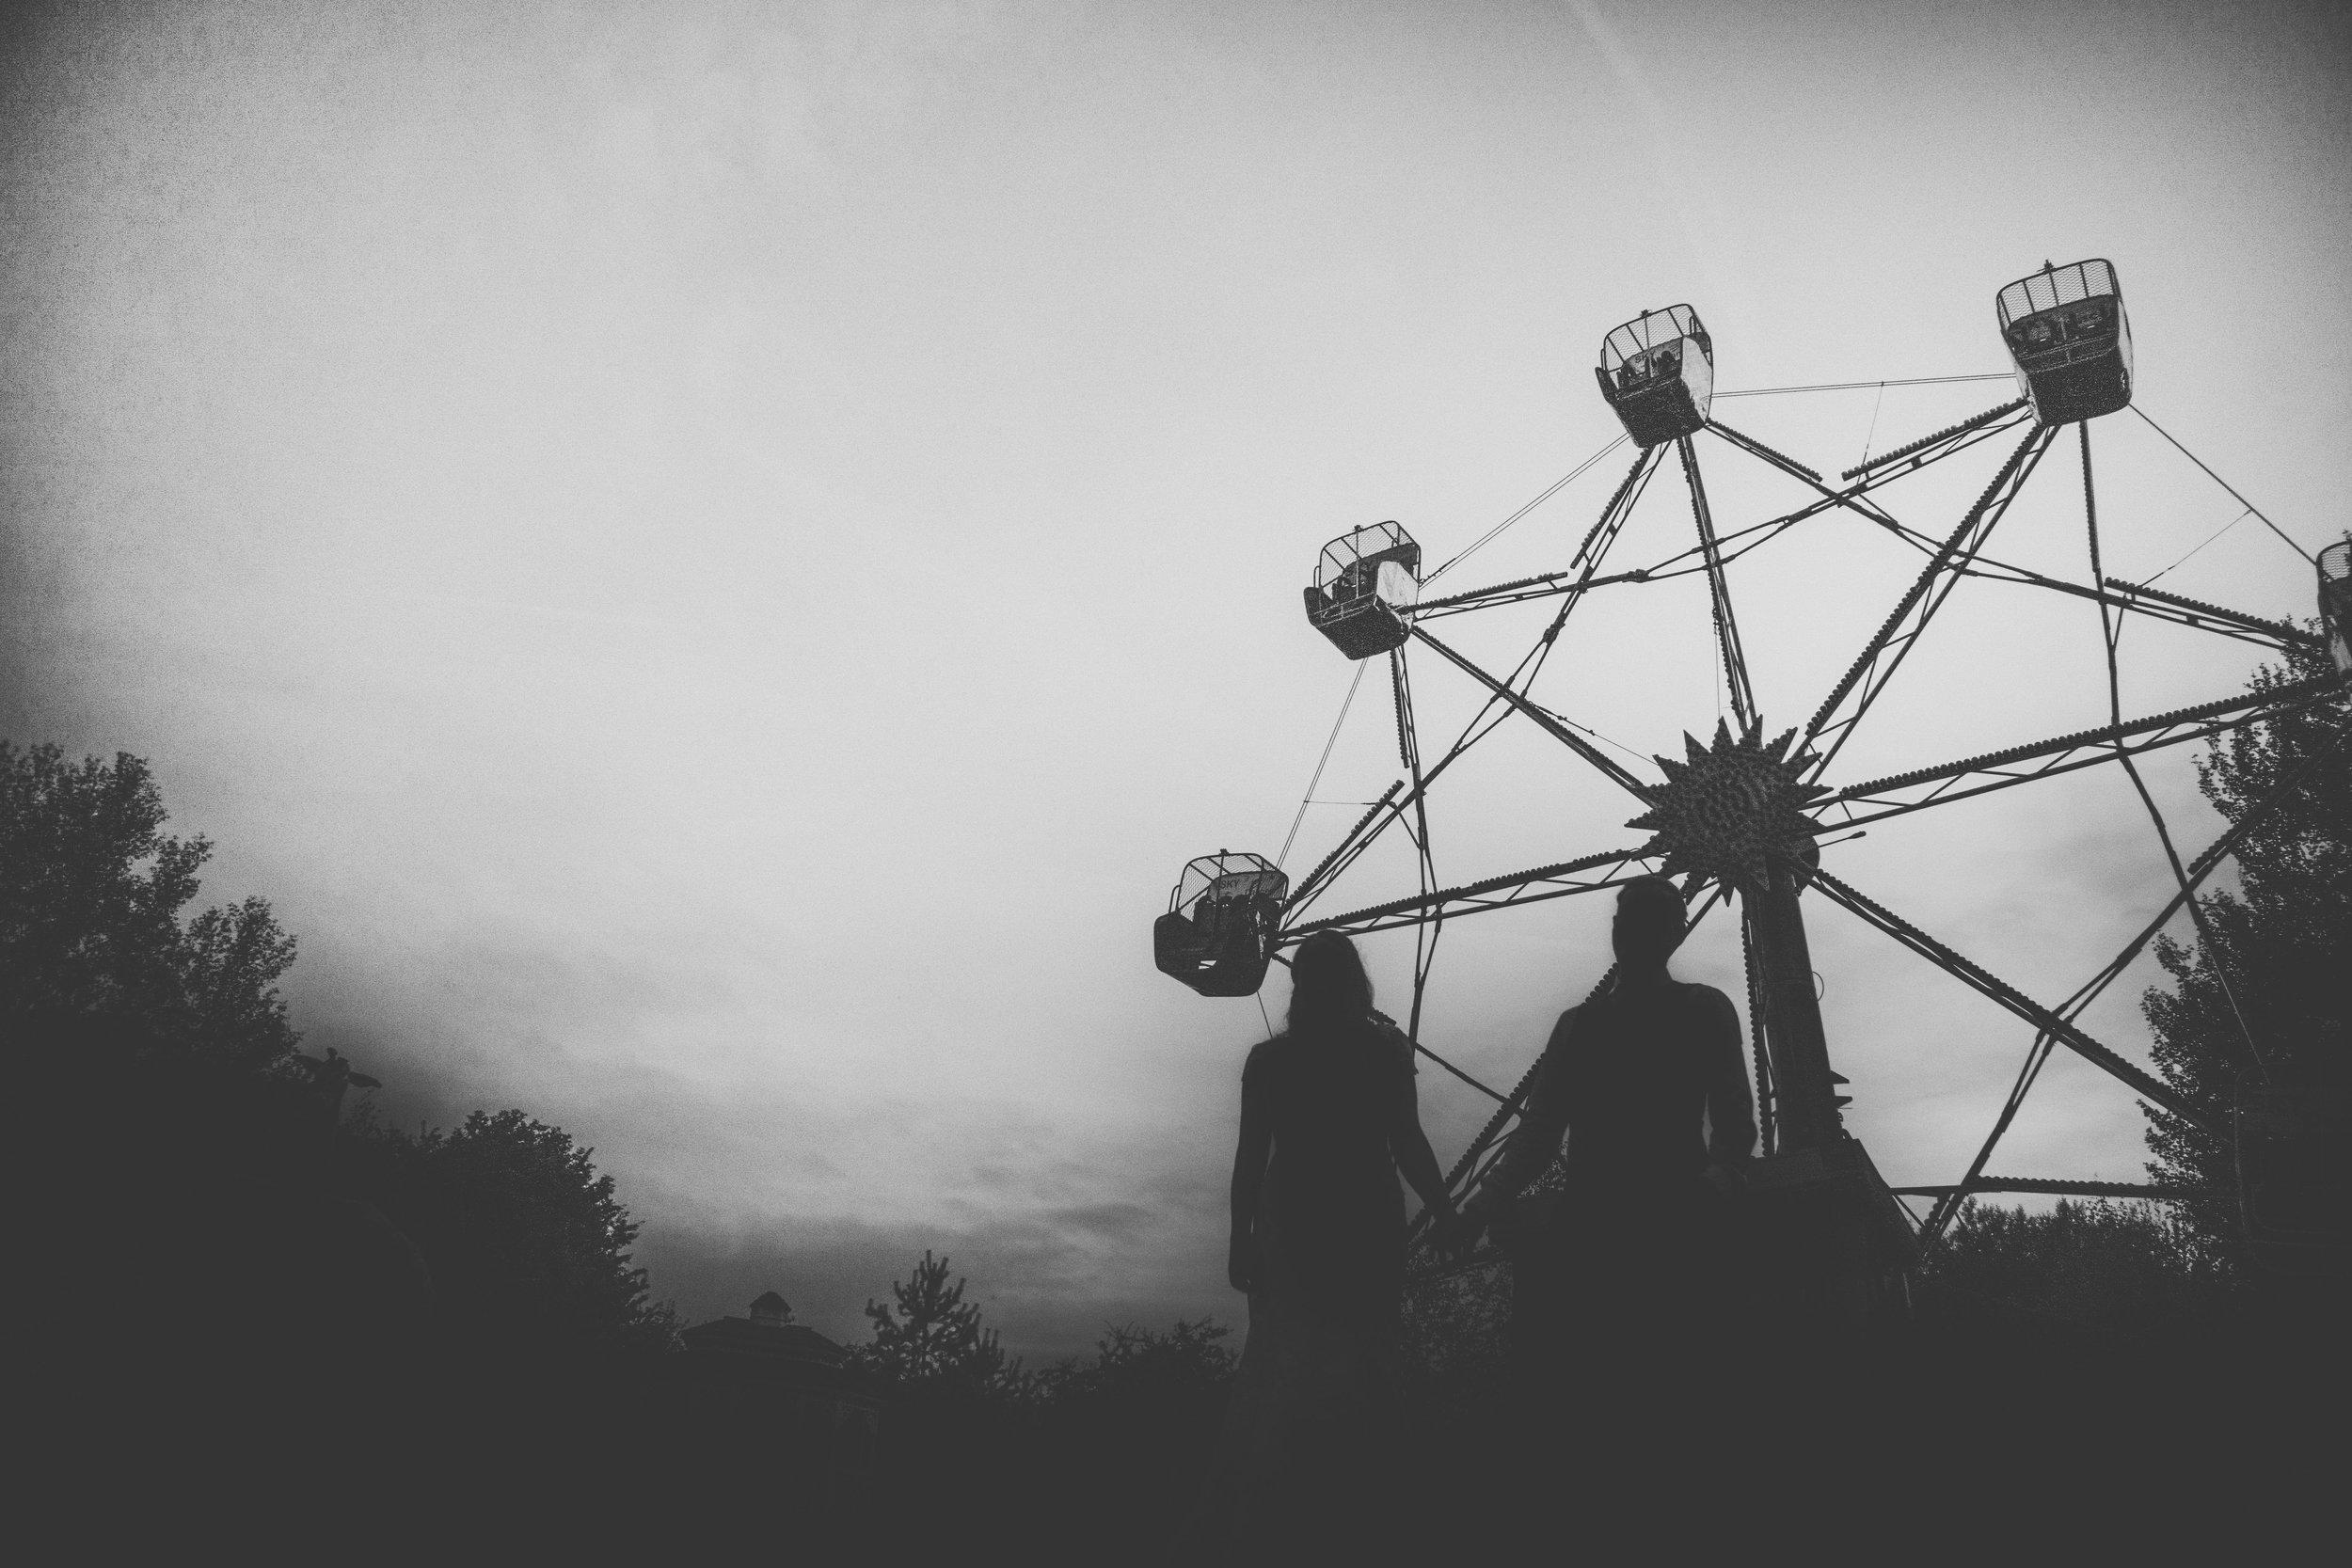 Fairground at Marleybrooks